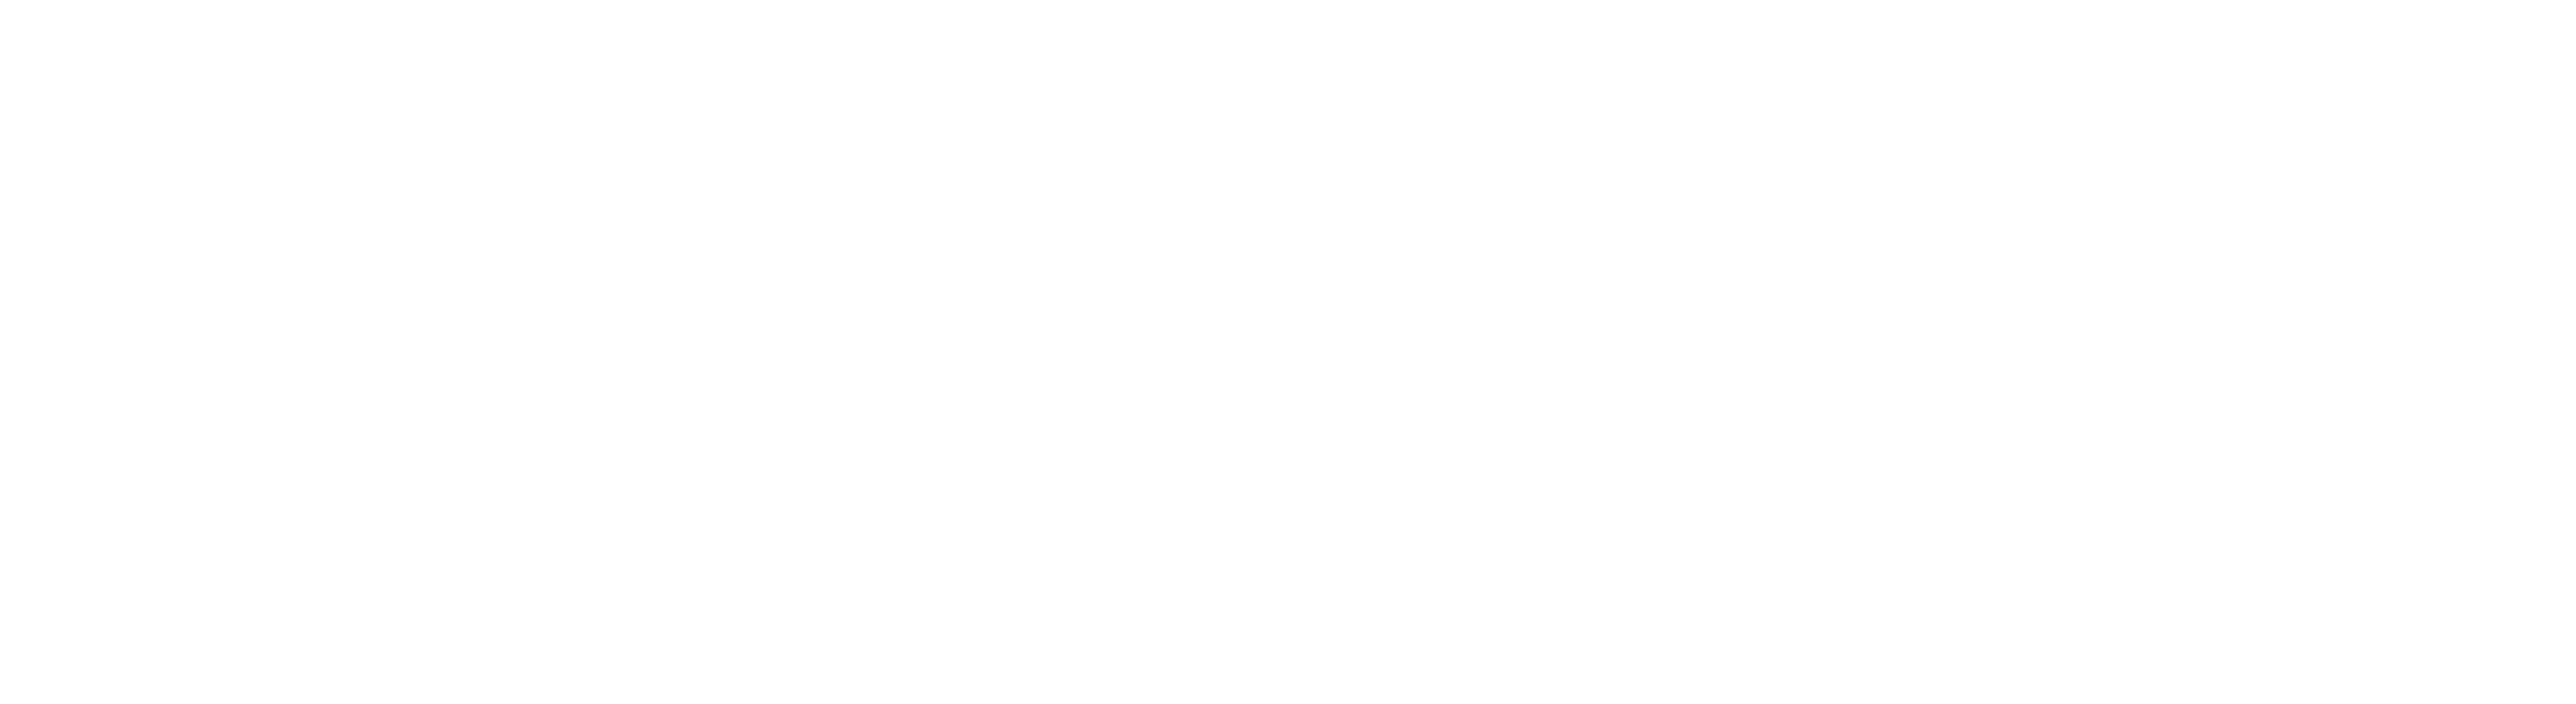 Samples — The Informed SLP